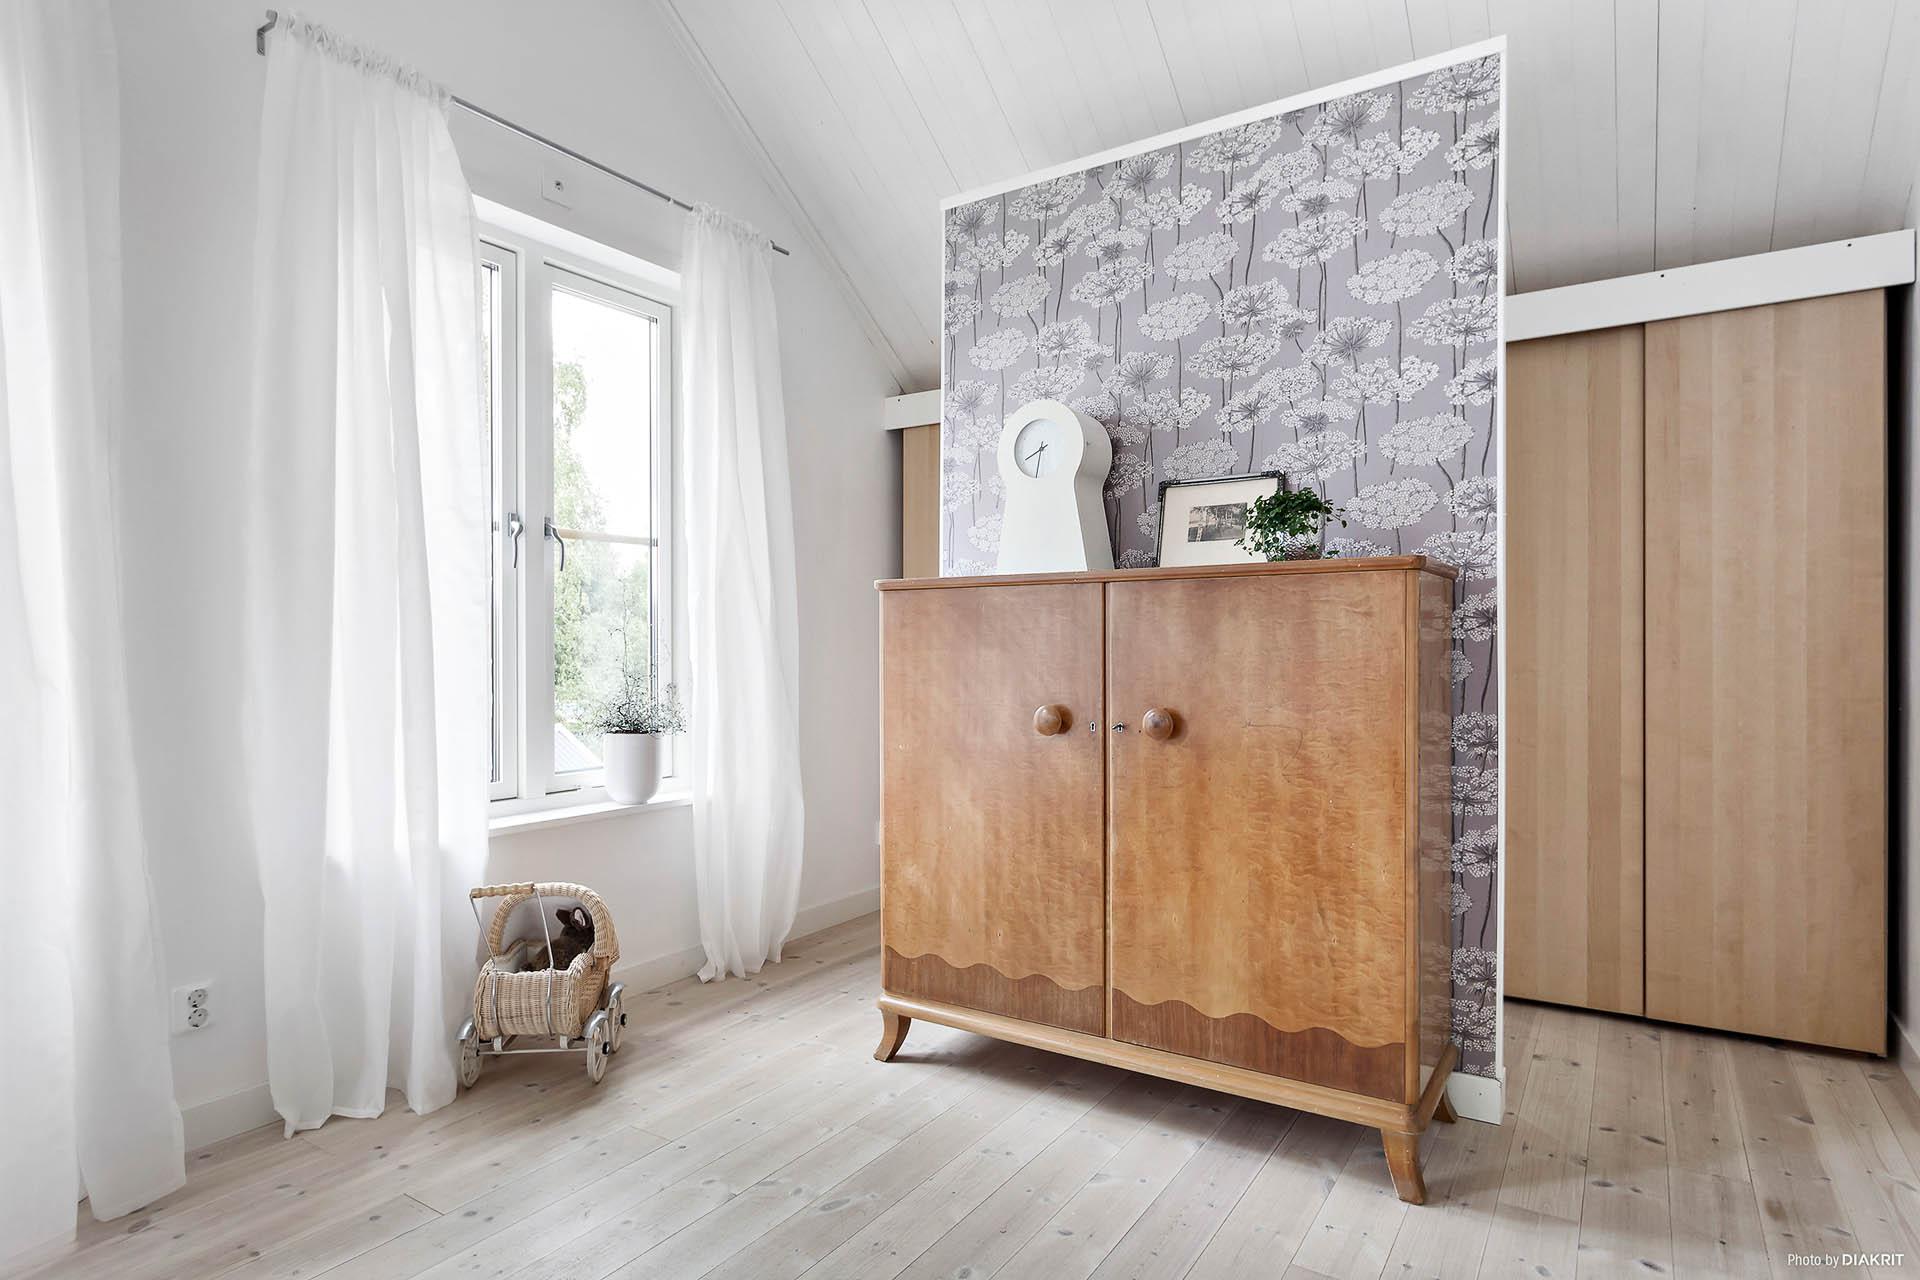 Sovrum 4 / Master bedroom